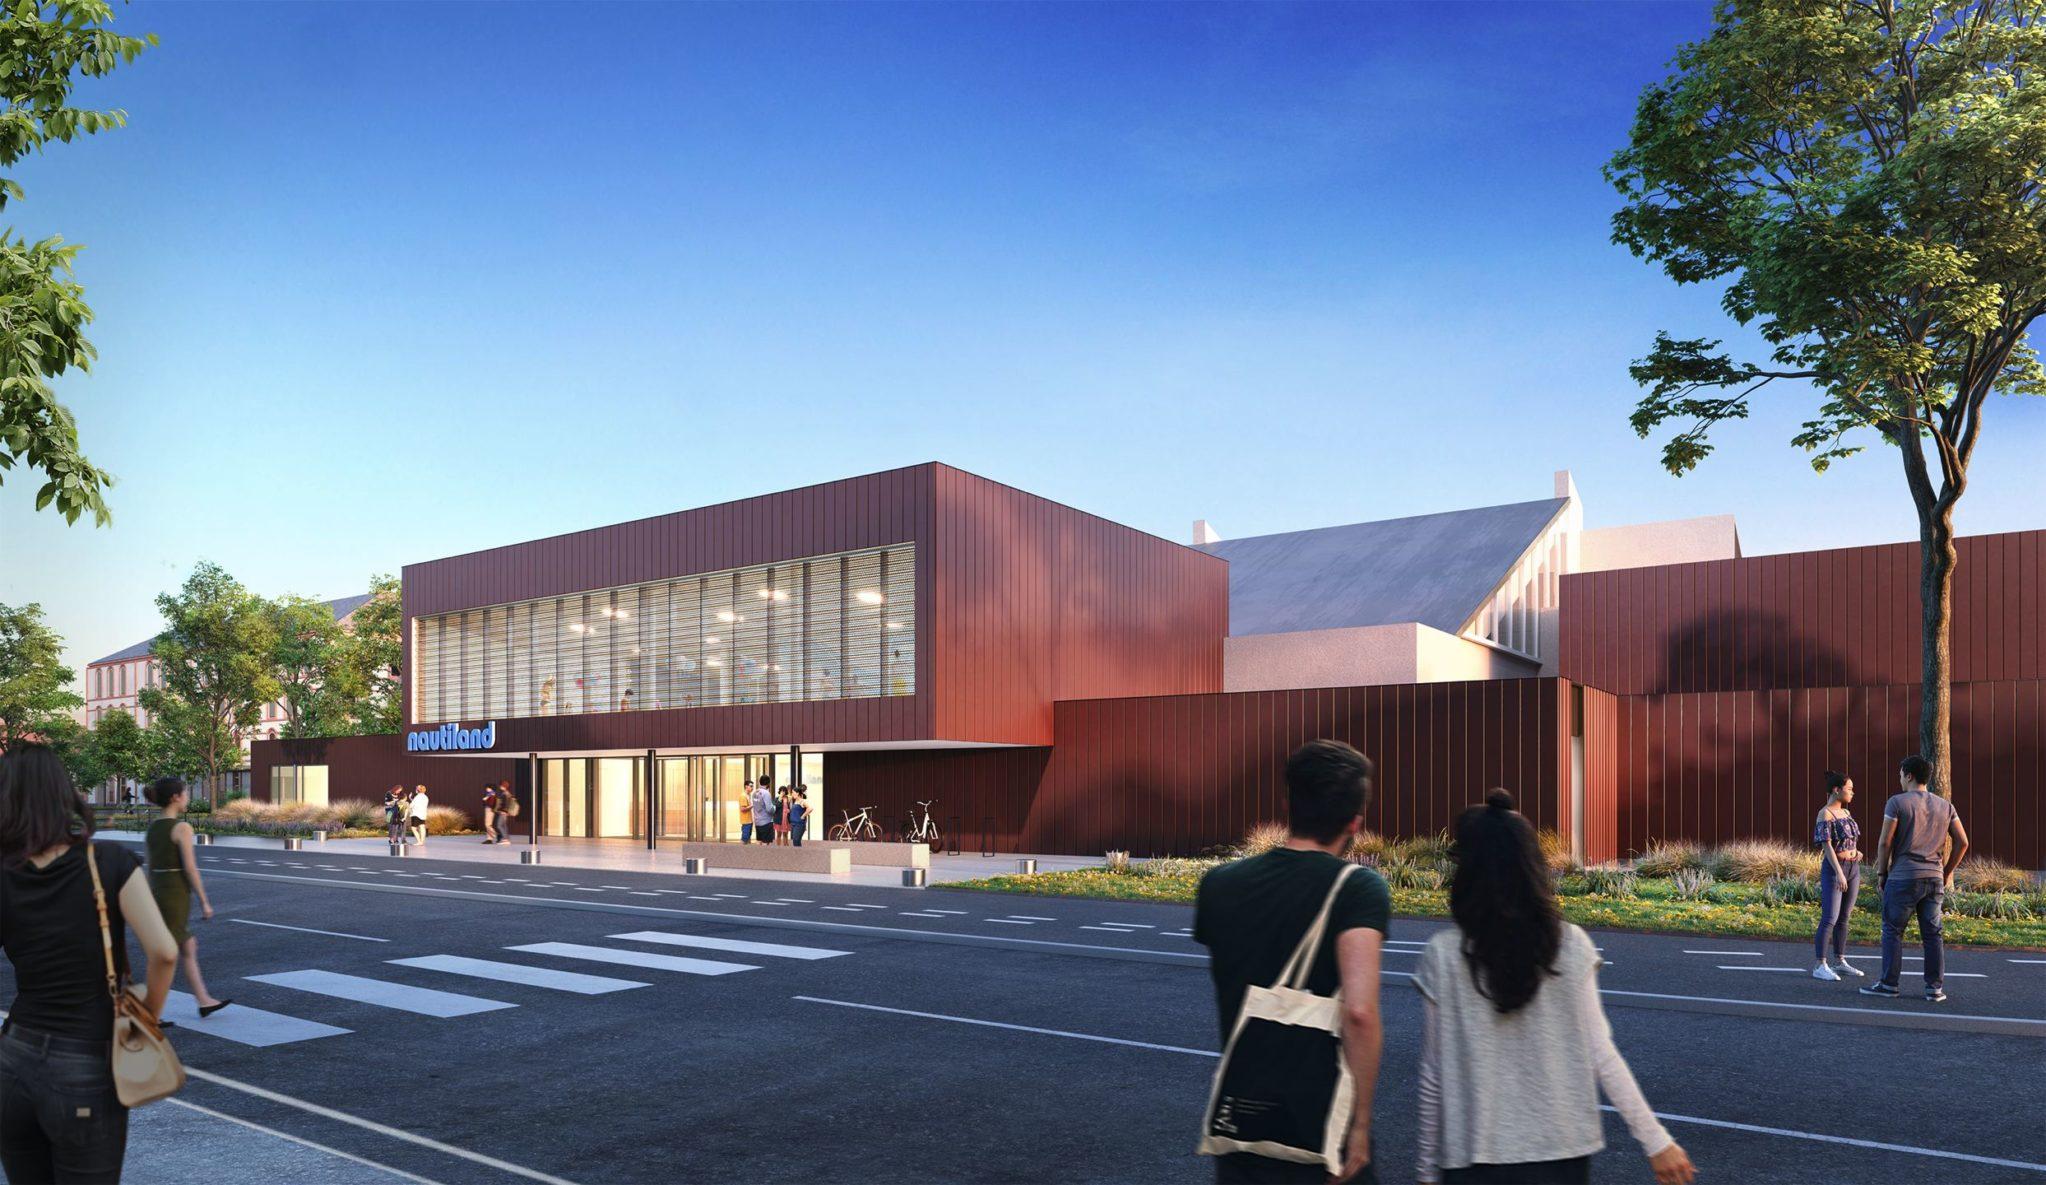 2021 • centre aquatique nautiland • haguenau [67]